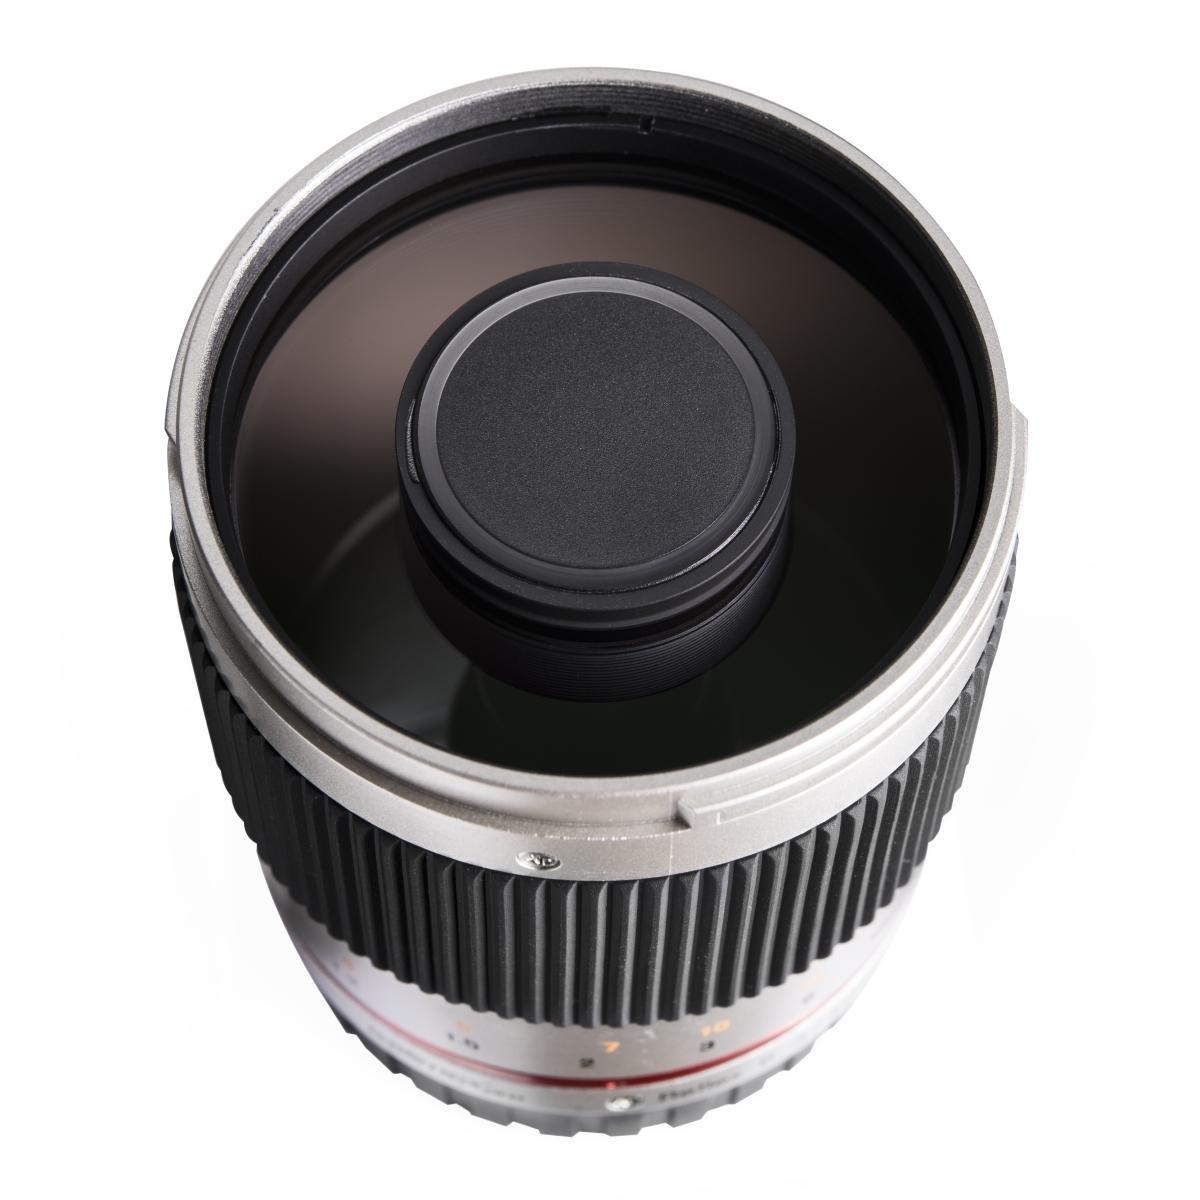 SLR, 9//9, telephoto, 64.5 mm, 73 mm, 311 g Walimex 19729 Lente de c/ámara Objetivo